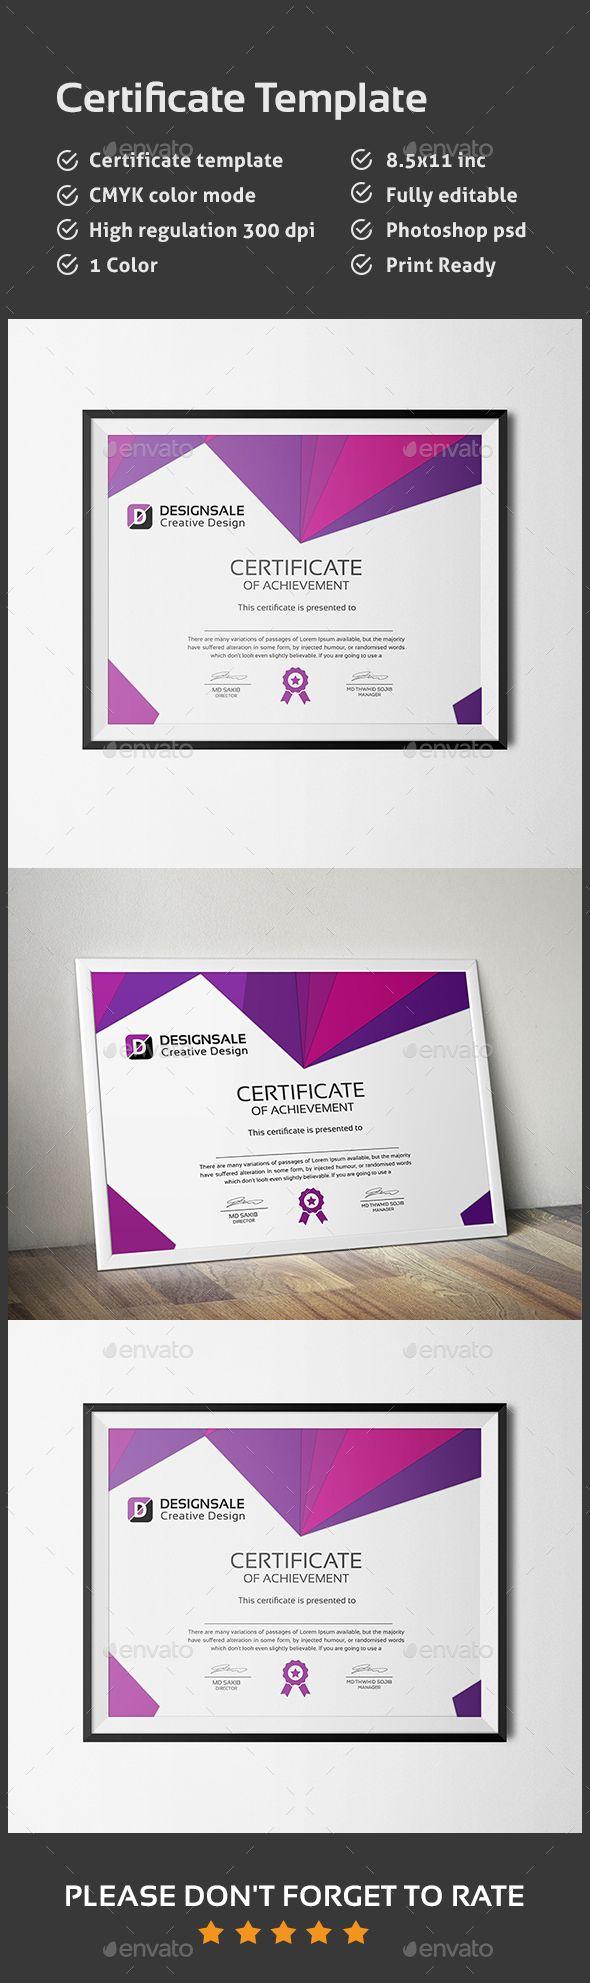 Certificate Template PSD. Download here: http://graphicriver.net/item/certificate/14343545?ref=ksioks